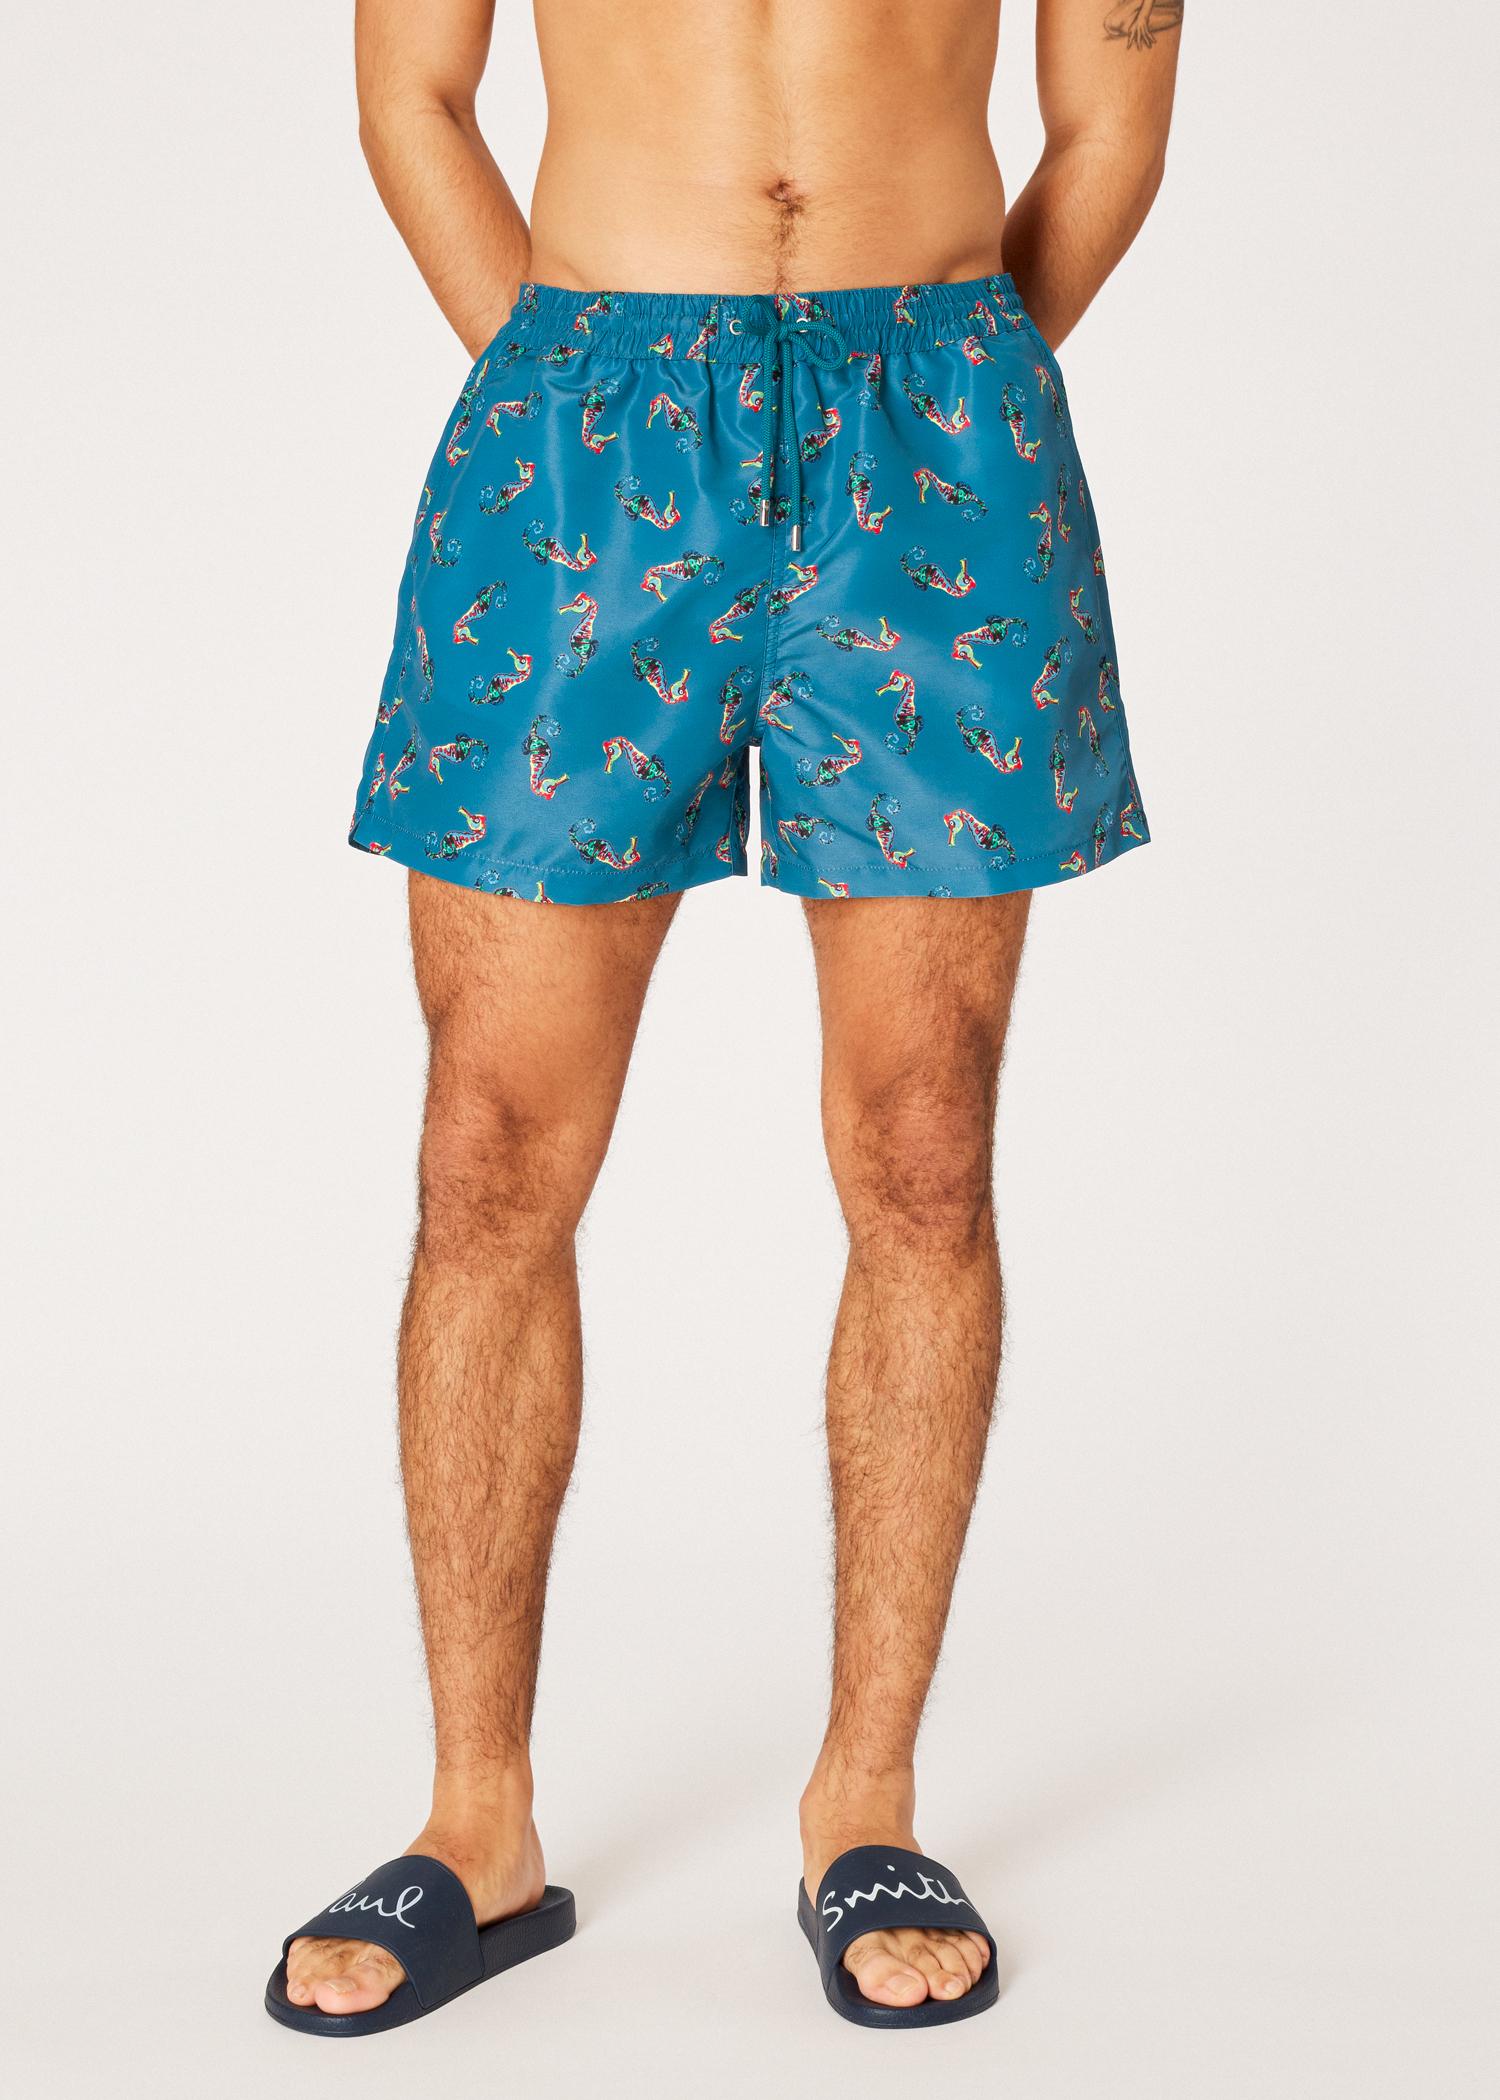 a1ac3c5c09 Model front View - Men's Petrol Blue 'Seahorse' Print Swim Shorts Paul Smith